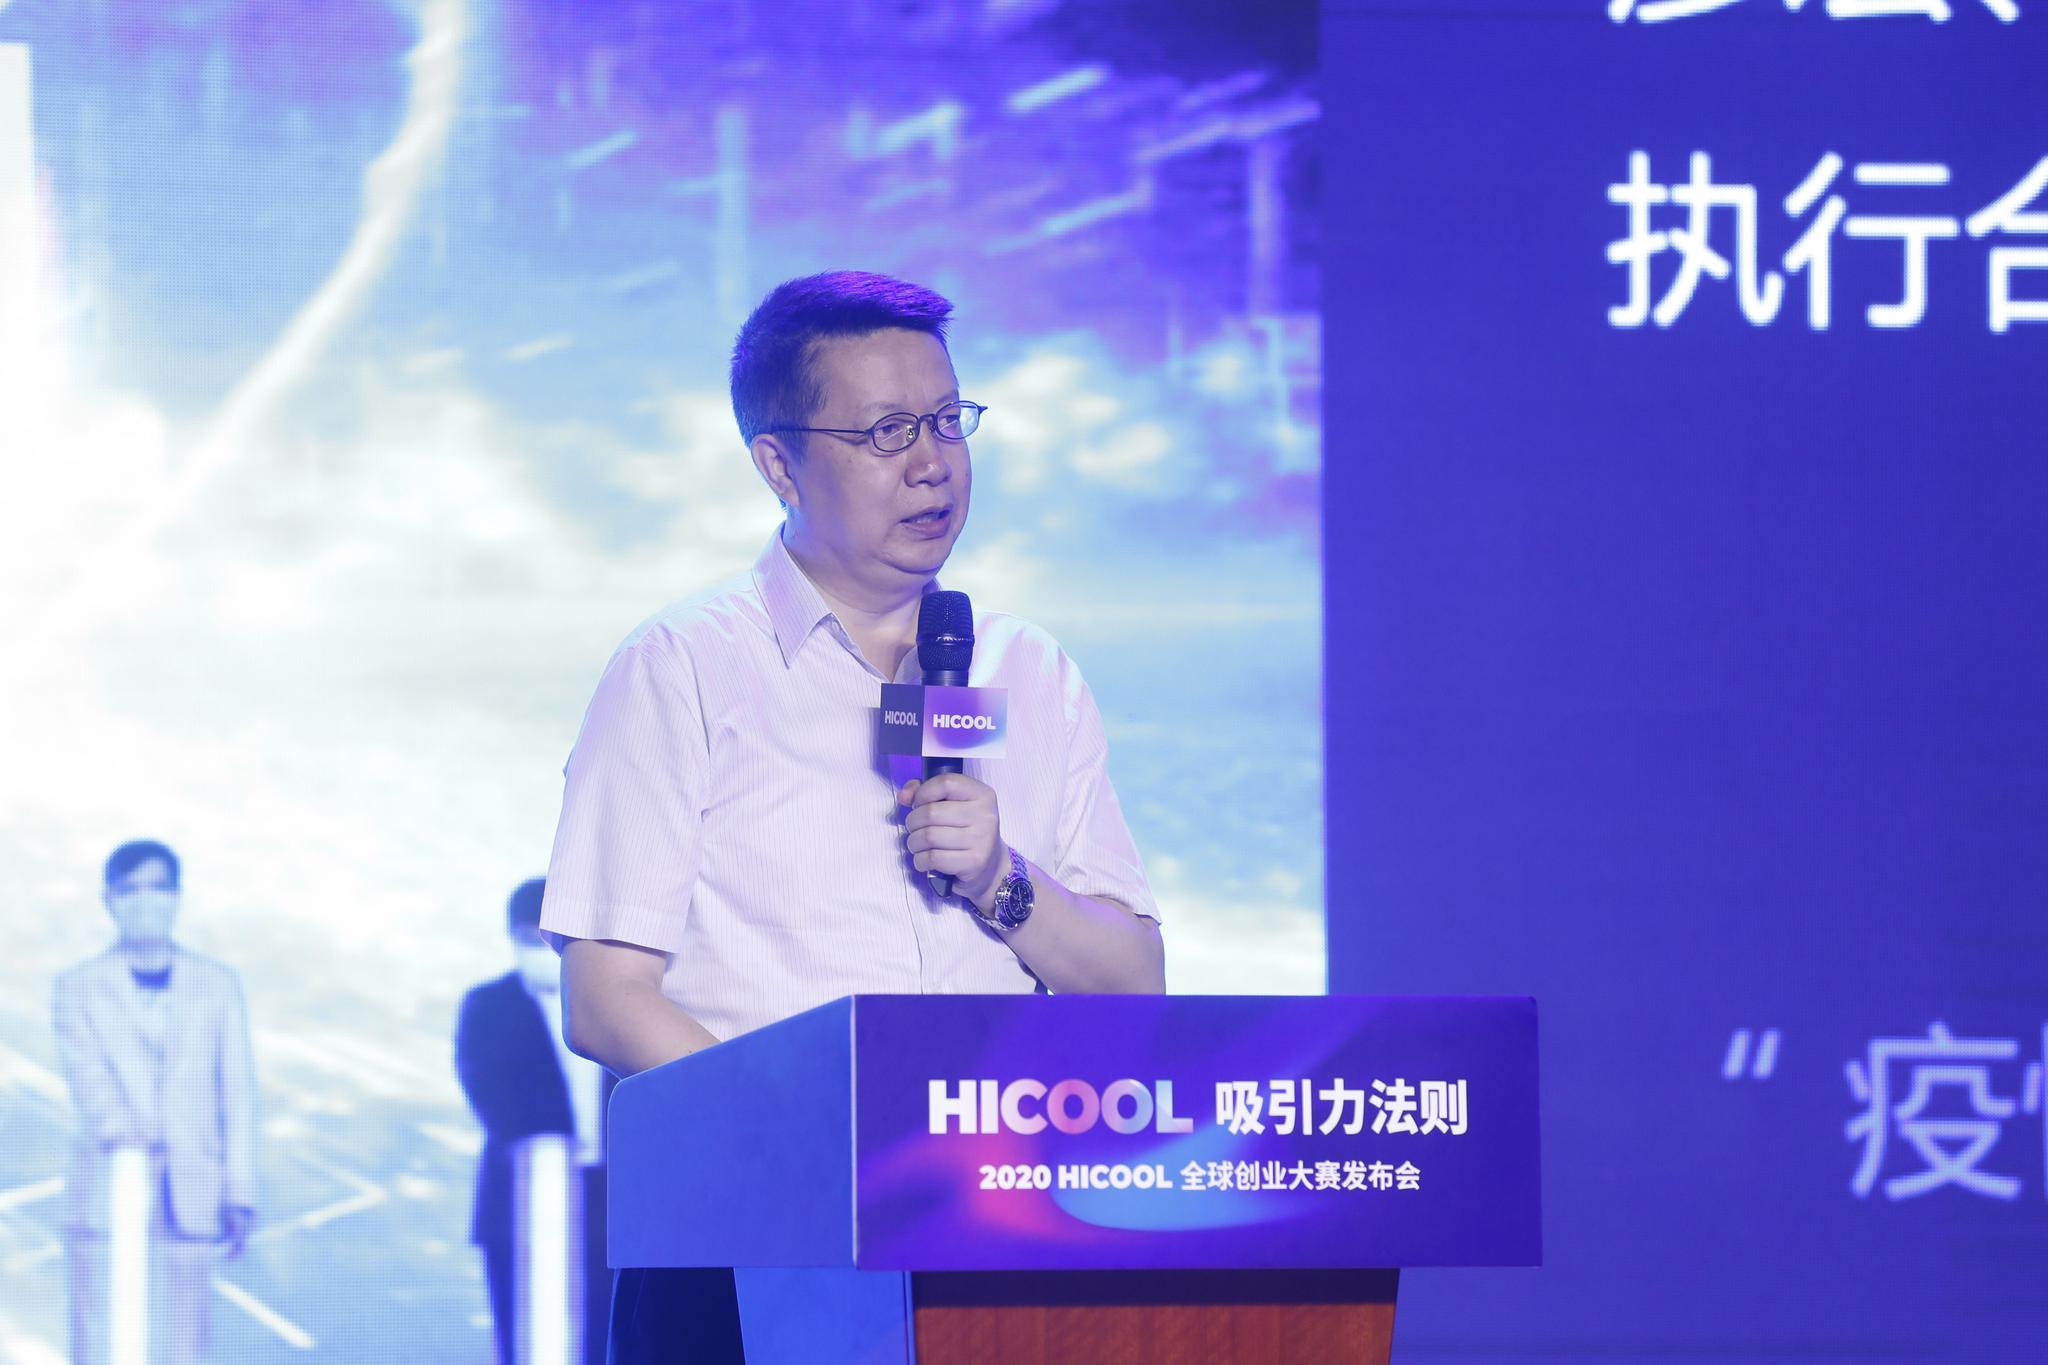 HICOOL 大赛公布战报,全球600多个项目入围初赛